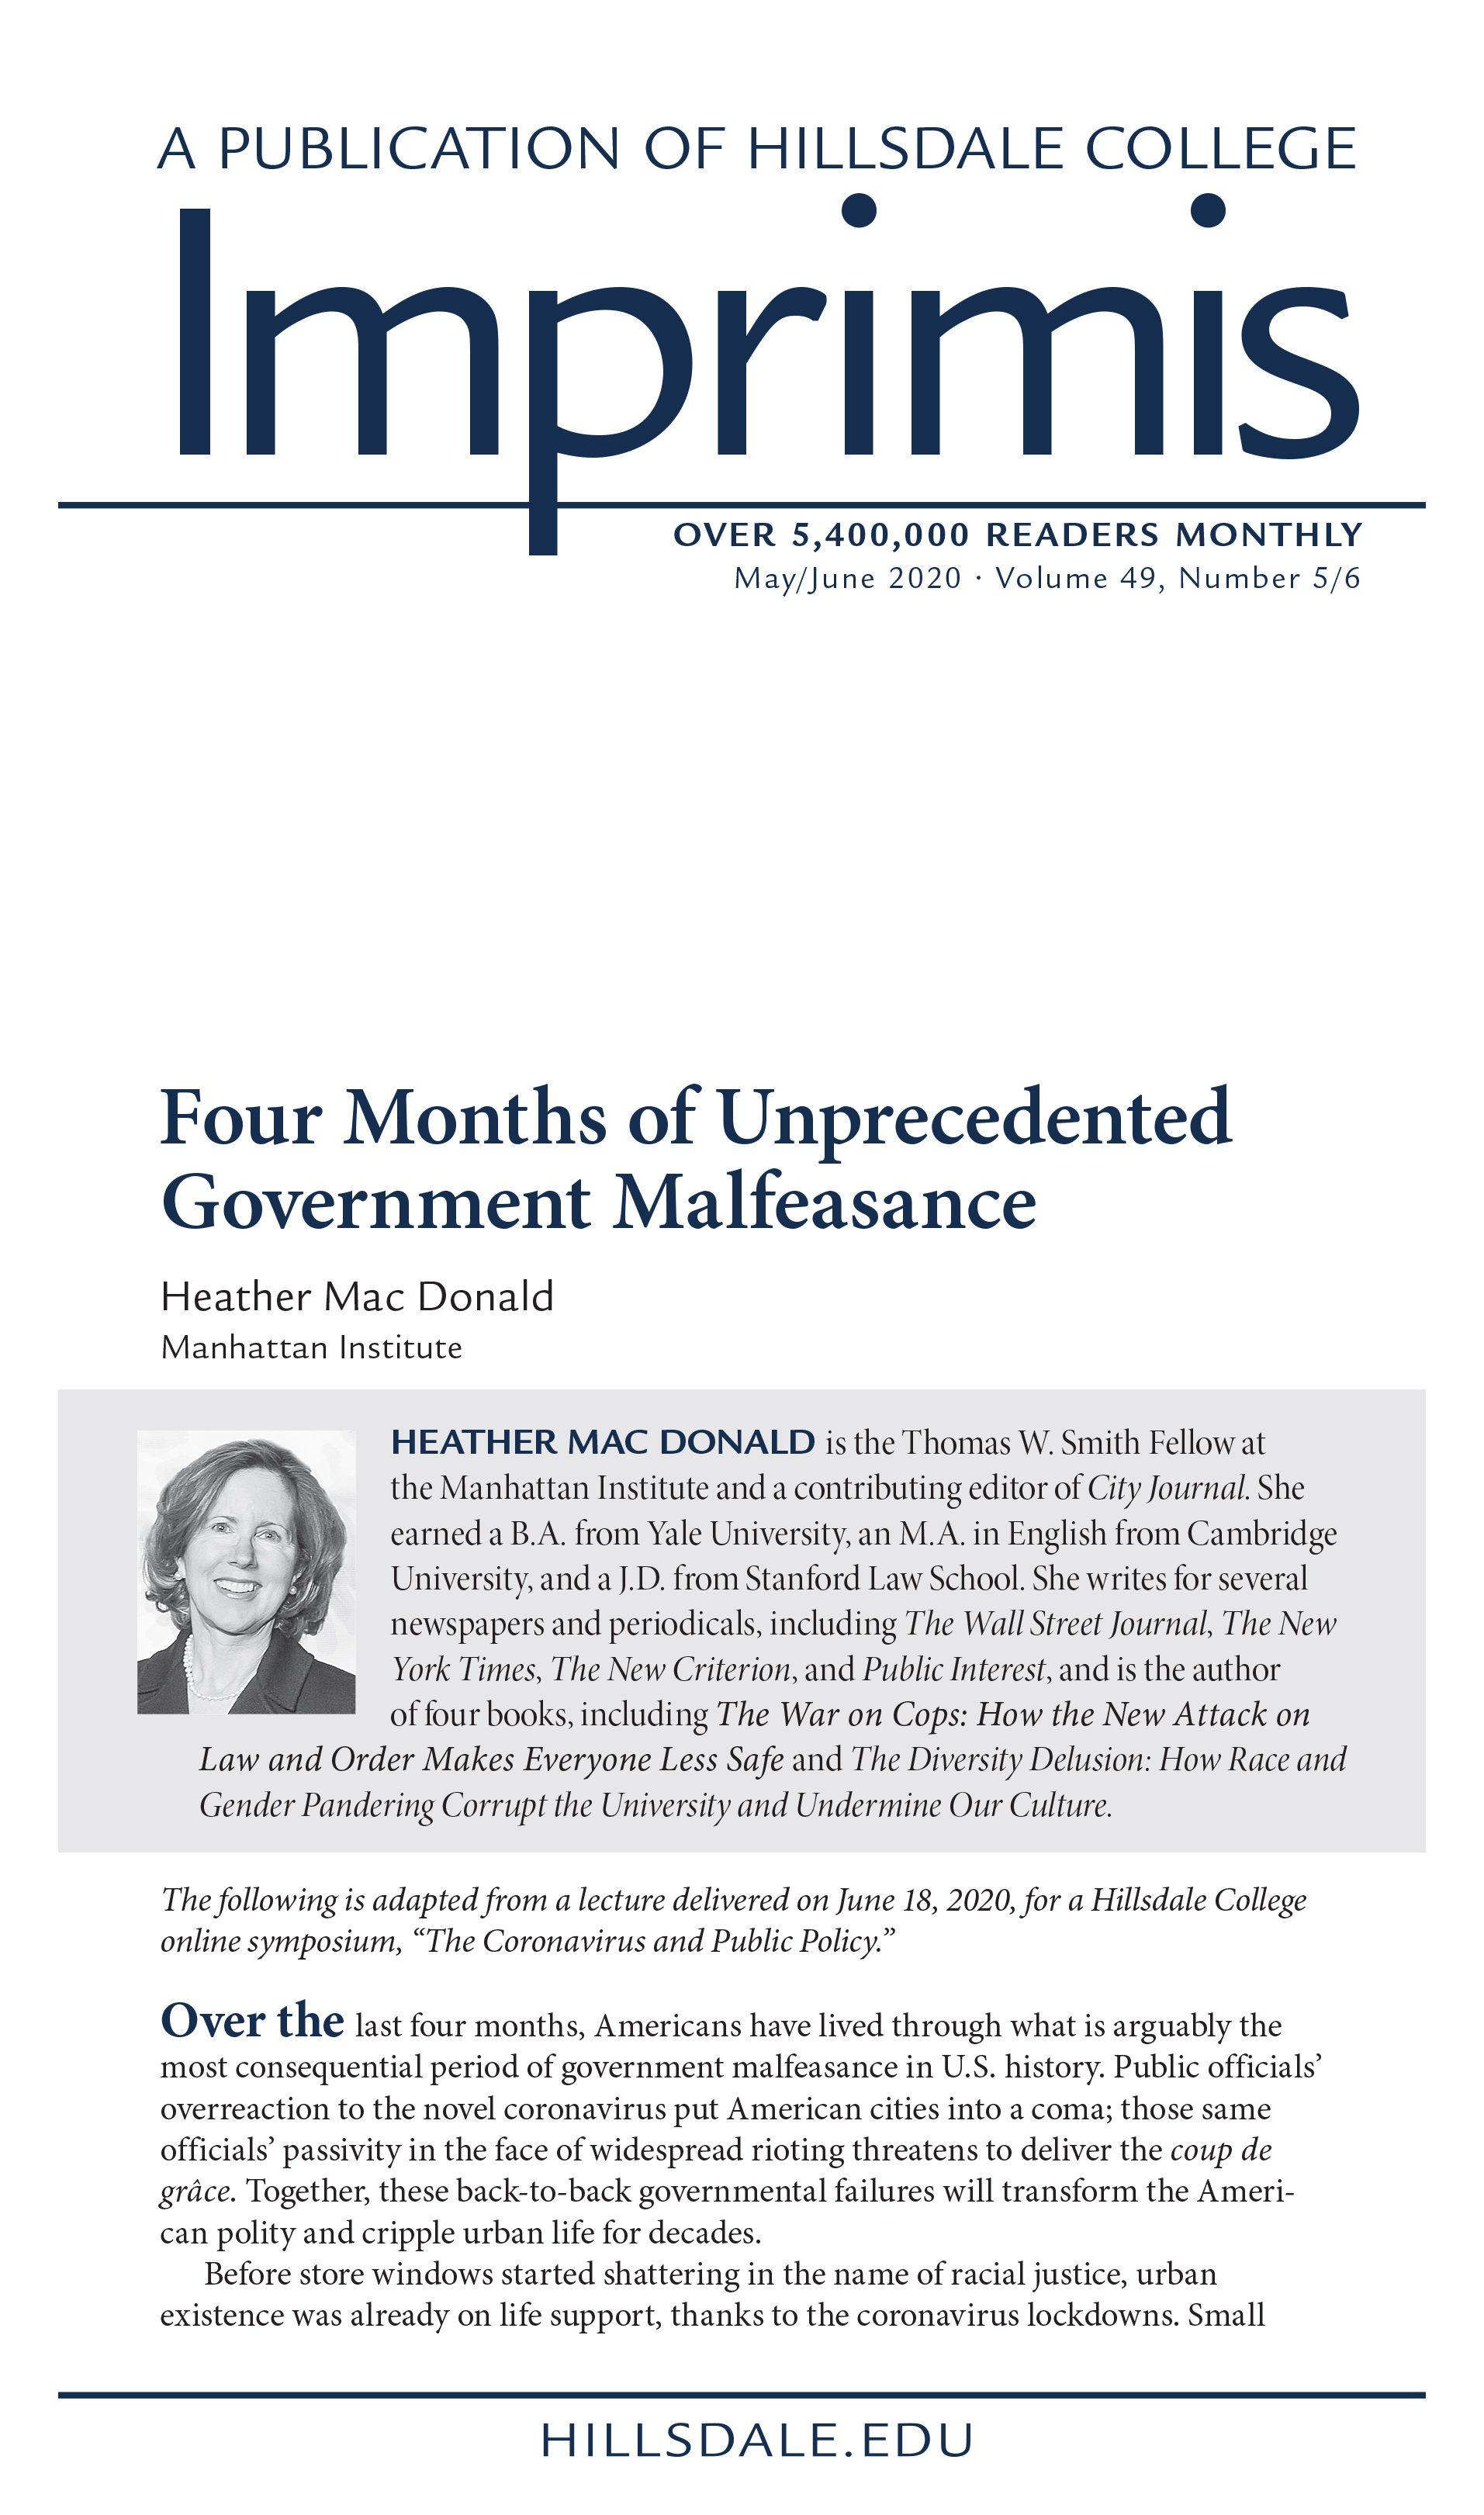 Provocative Piece by Economist Heather Mac Donald: Four Months of Unprecedented Government Malfeasance